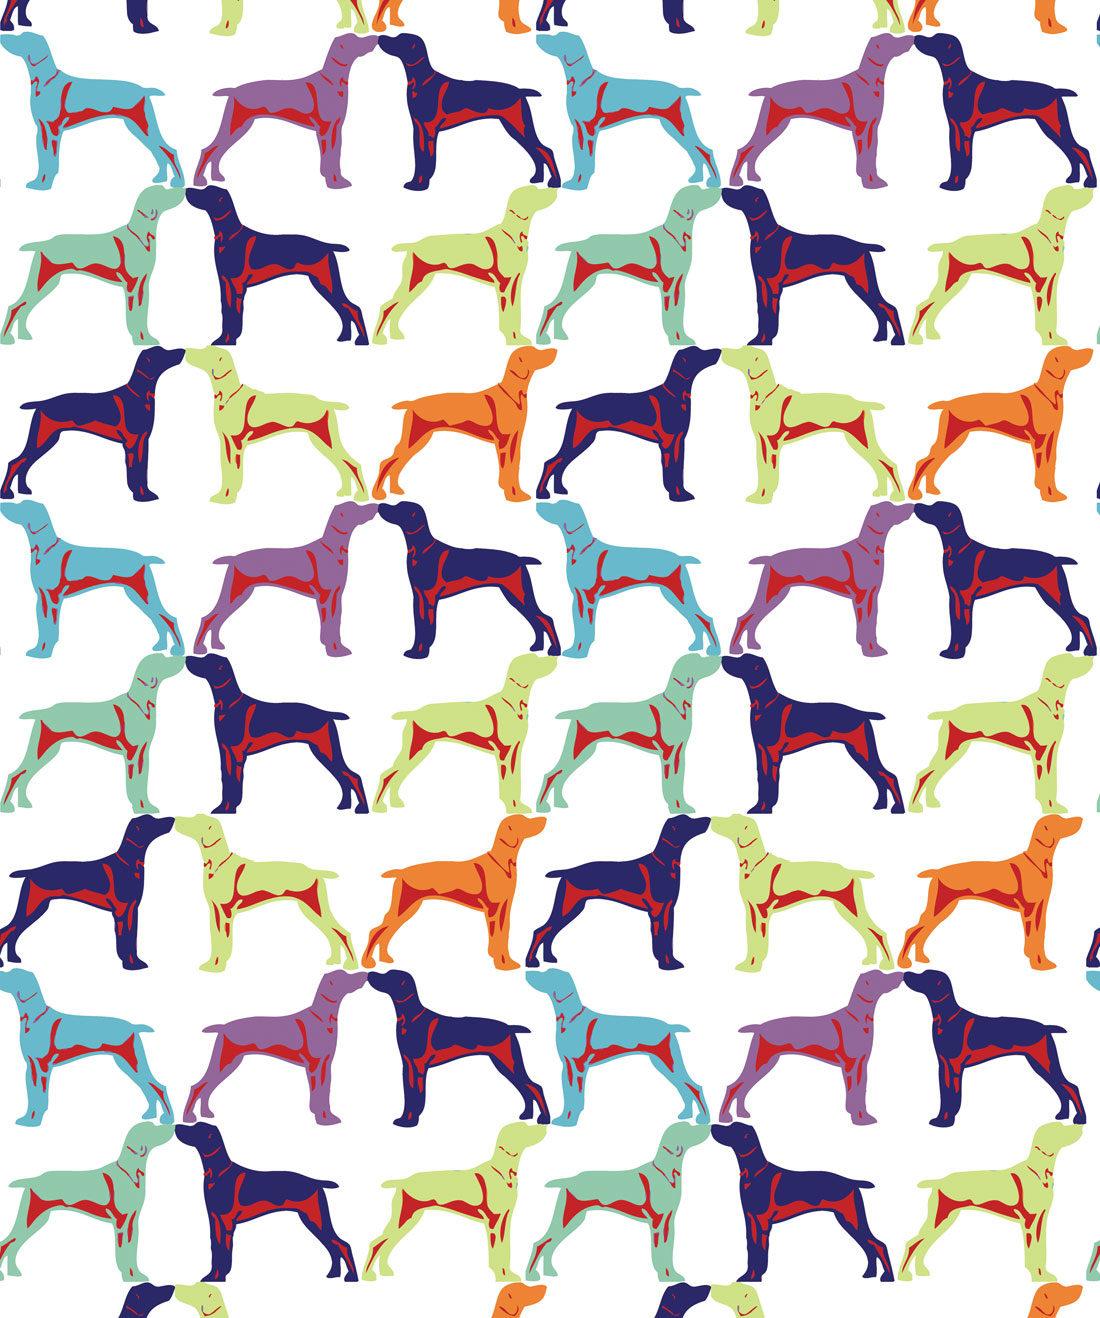 Off The Leash Contemporary Dog Wallpaper For Walls Milton King Eu